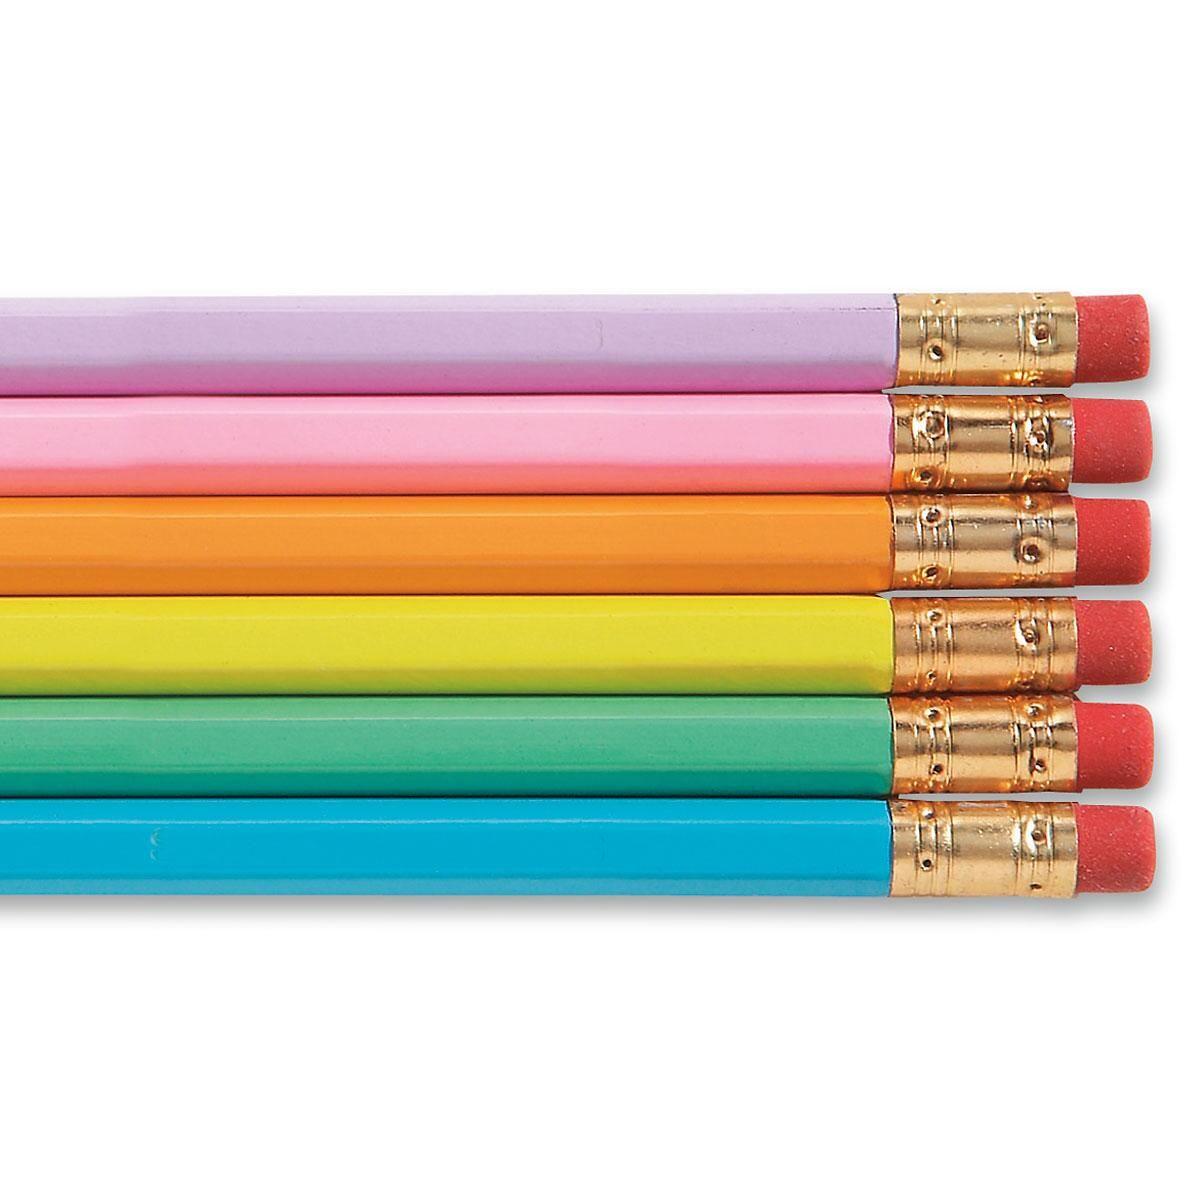 Hardwood #2 Pencils